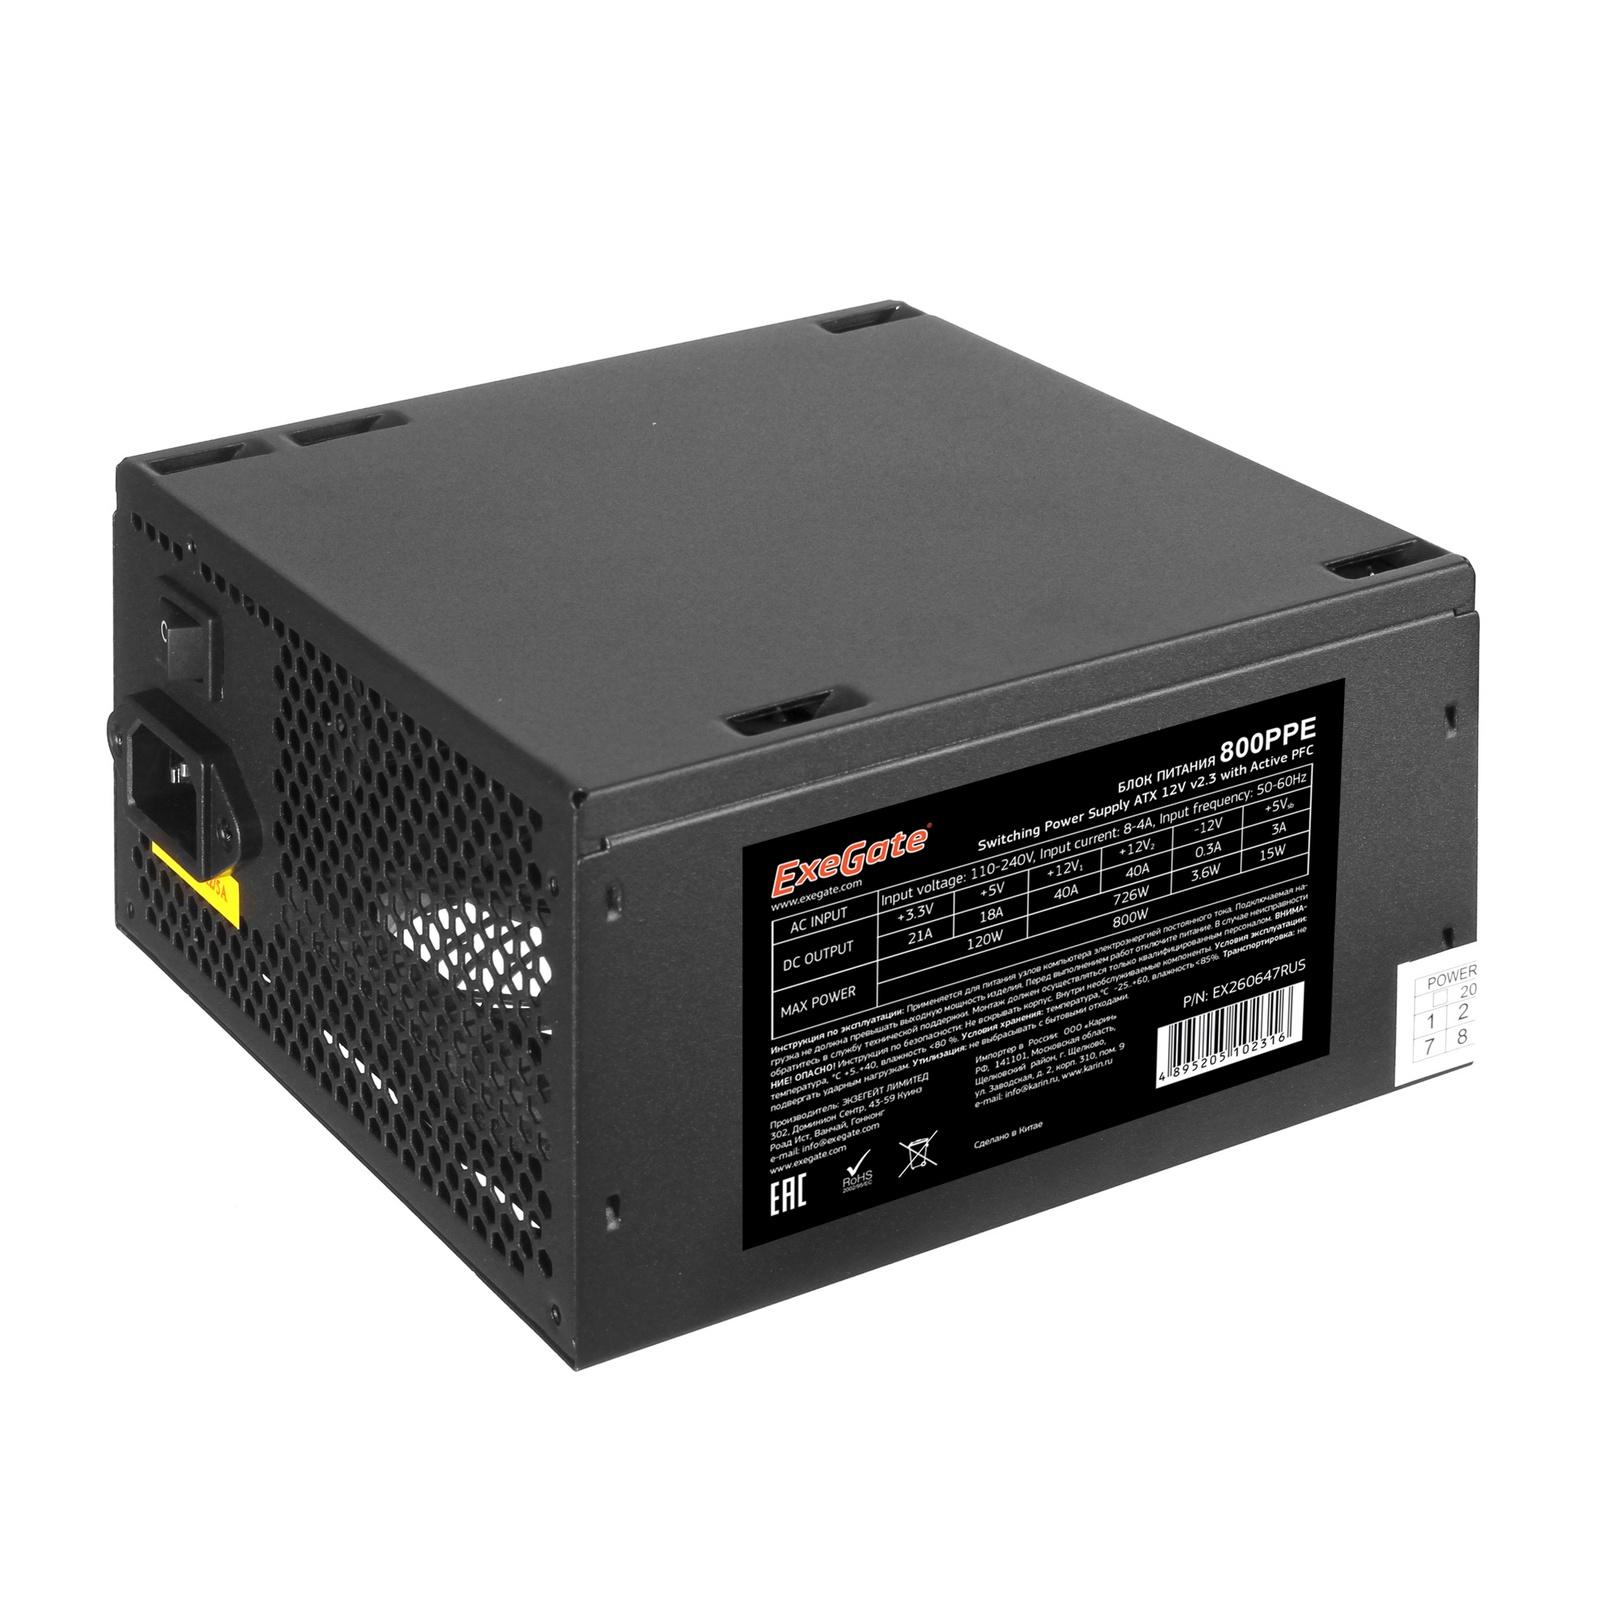 Блок питания 800W Exegate 800PPE, ATX, black, APFC, 12cm, 24p+(4+4)p, PCI-E, 3*IDE, 5*SATA, FDD braun jb 5050 белый